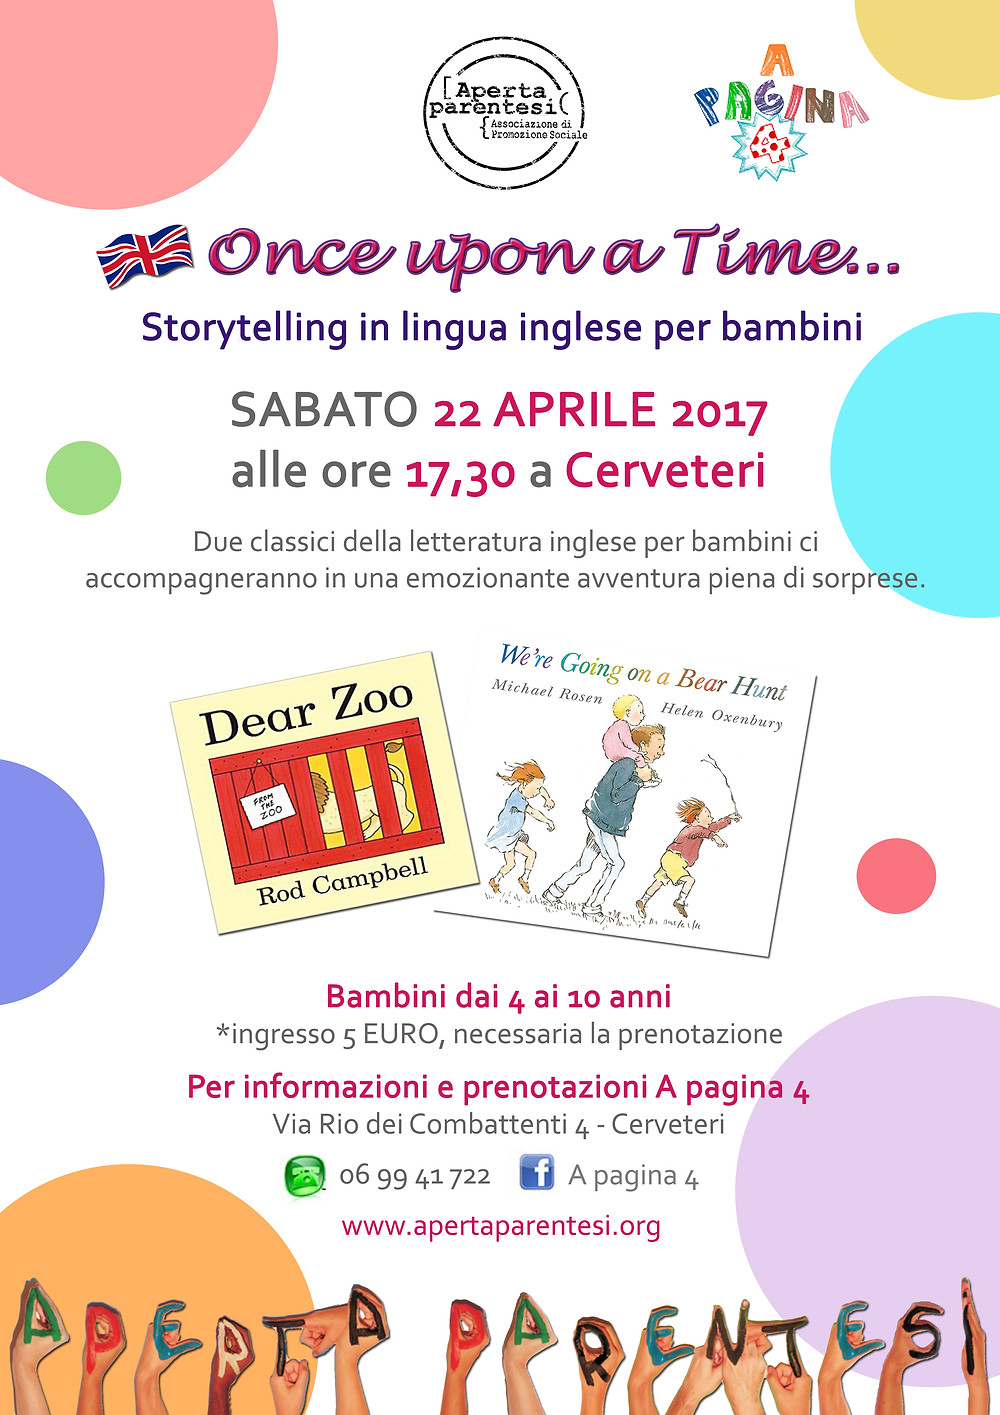 Storytelling in lingua inglese per bambini